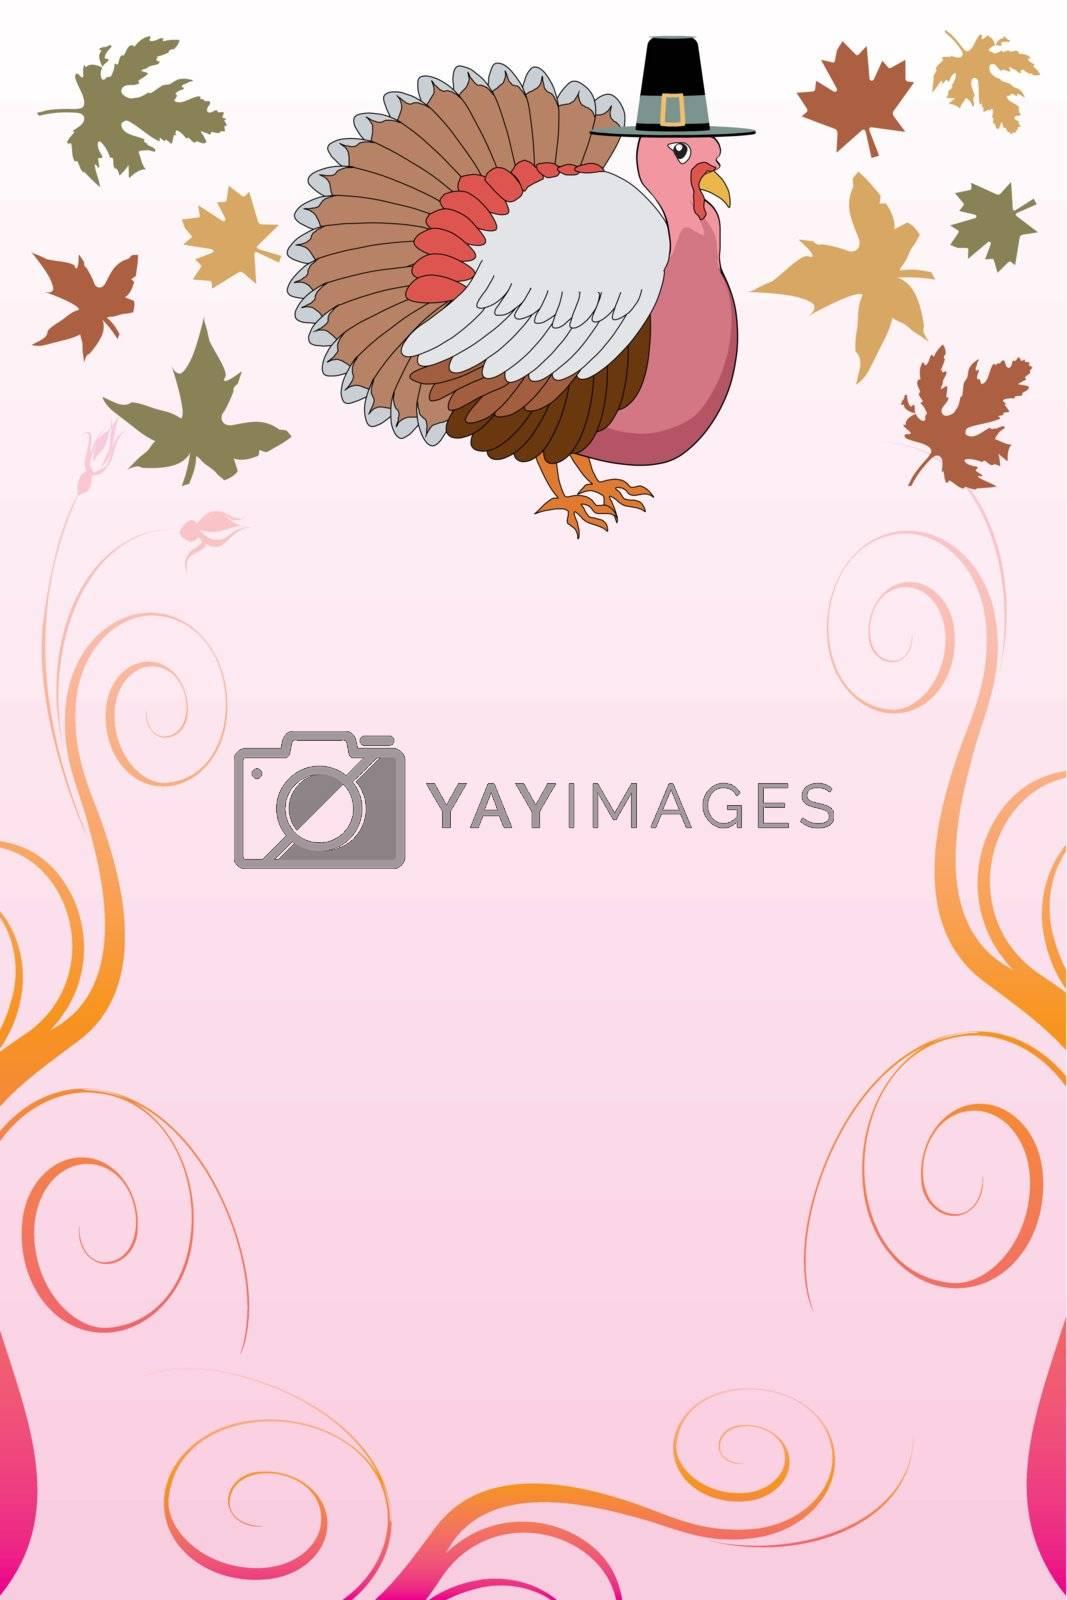 Vector Illustration of a Thanksgiving Background with Thanksgiving Turkey and pink background.